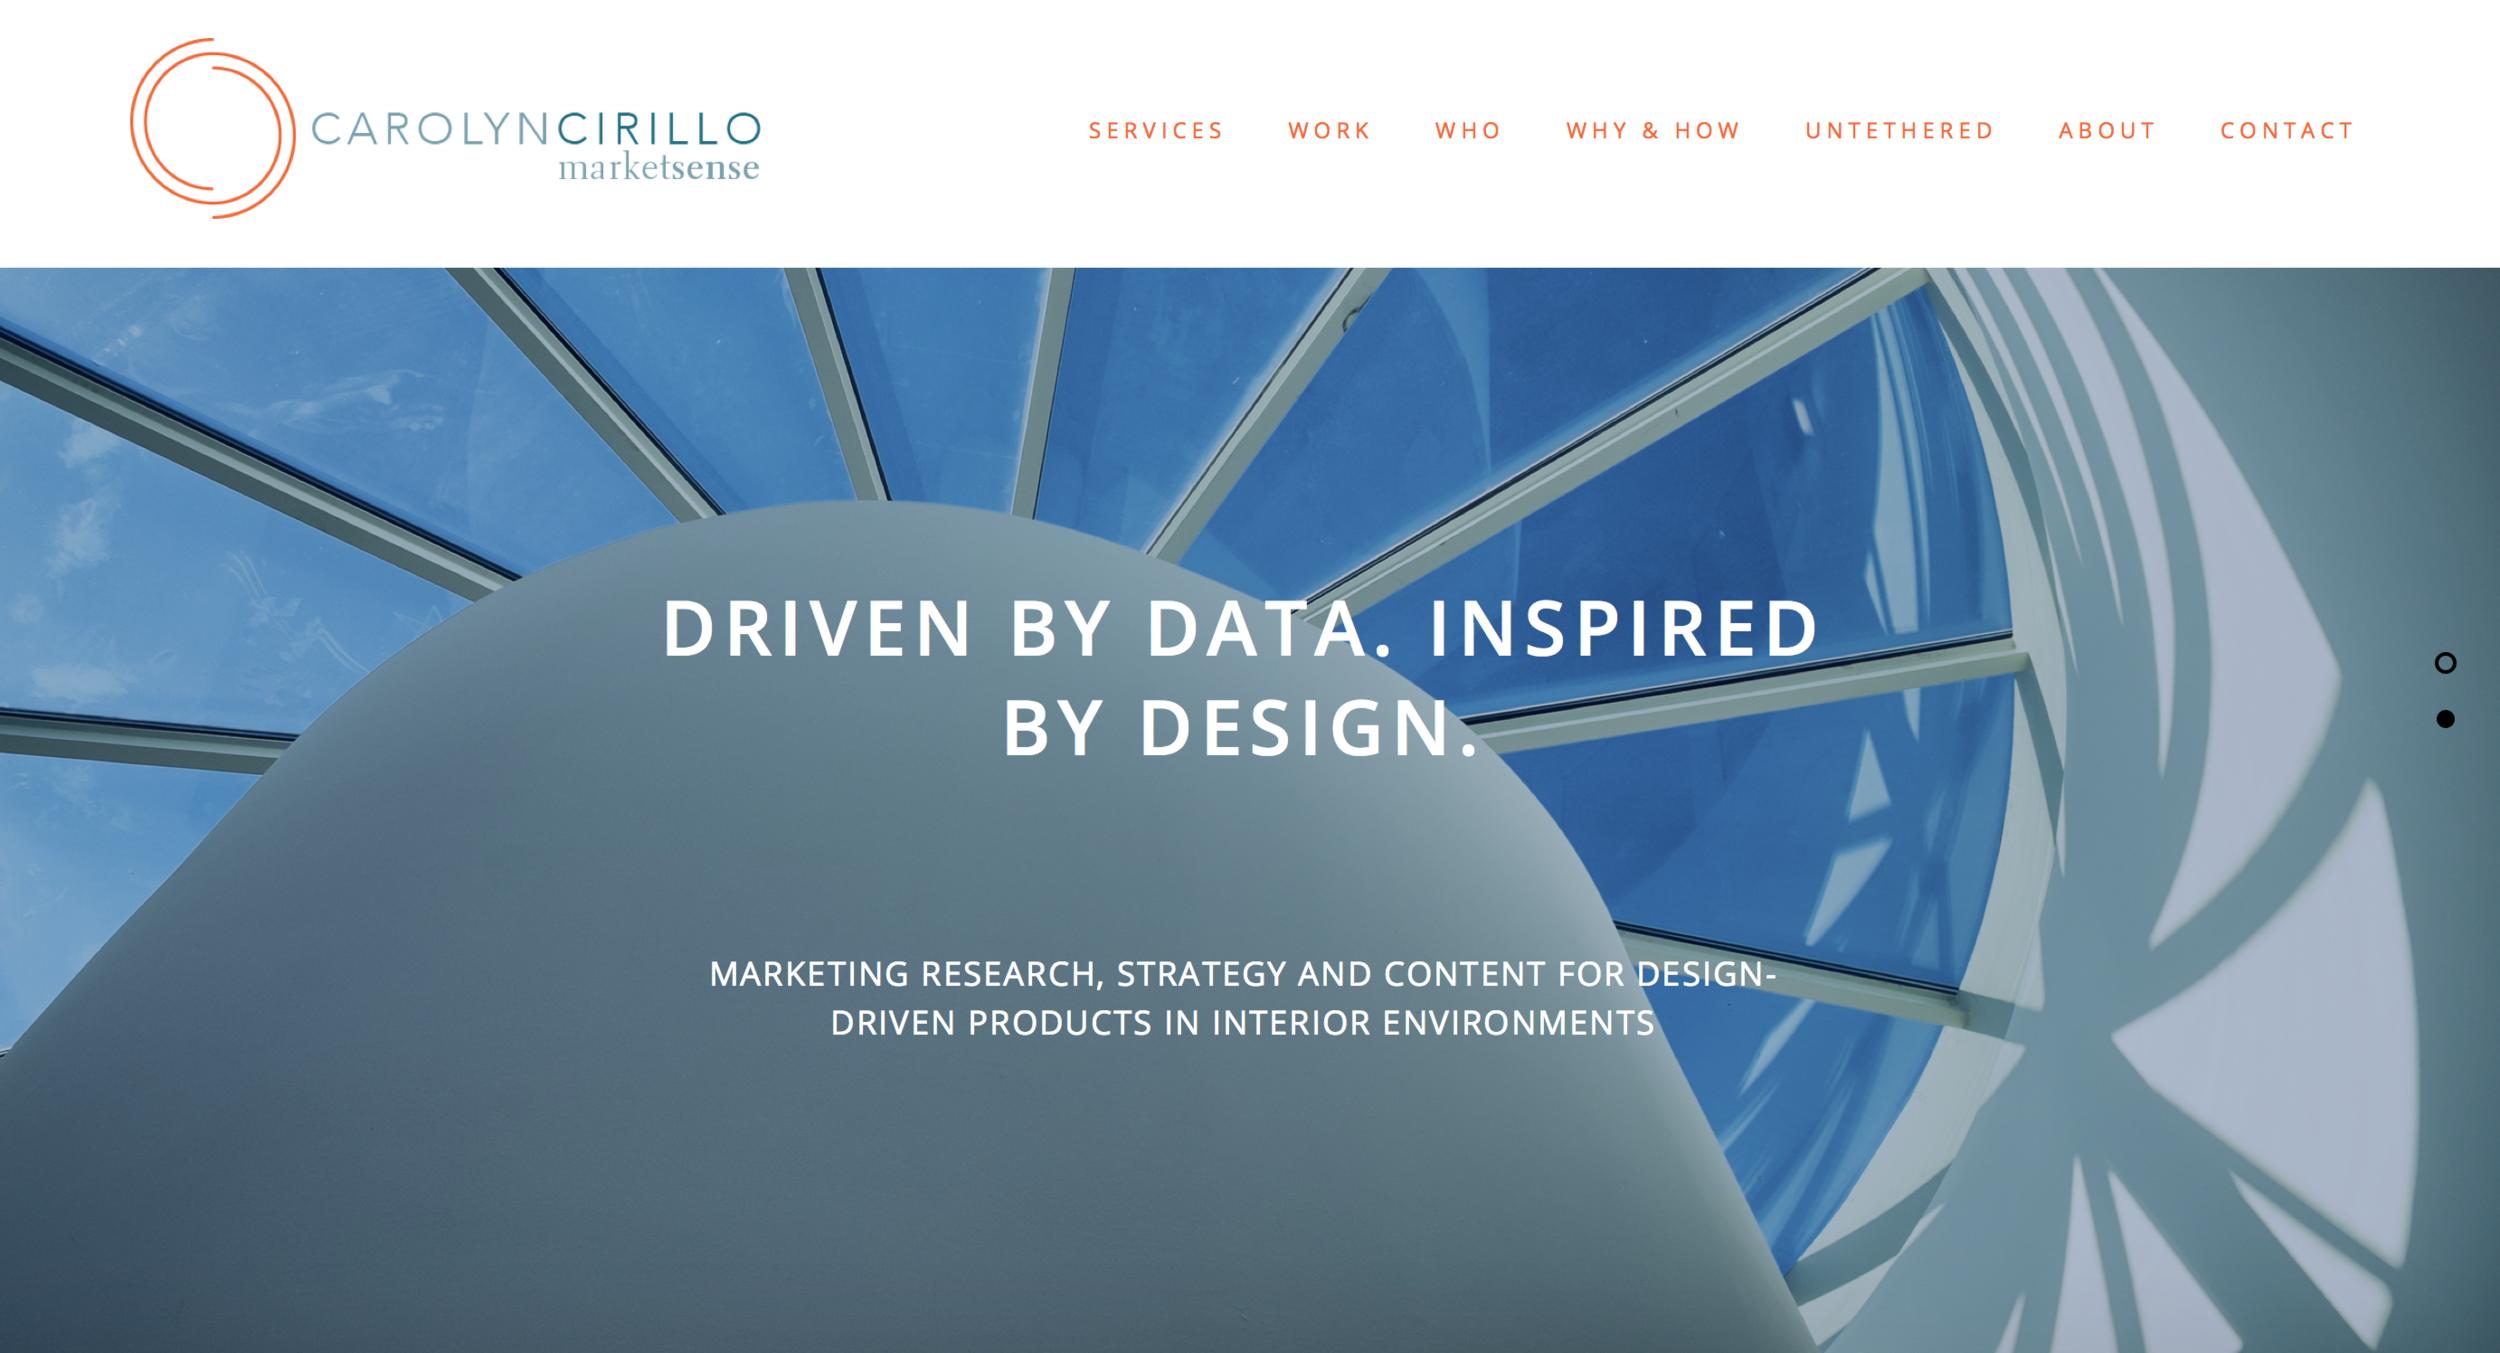 The homepage for Carolyn Cirillo